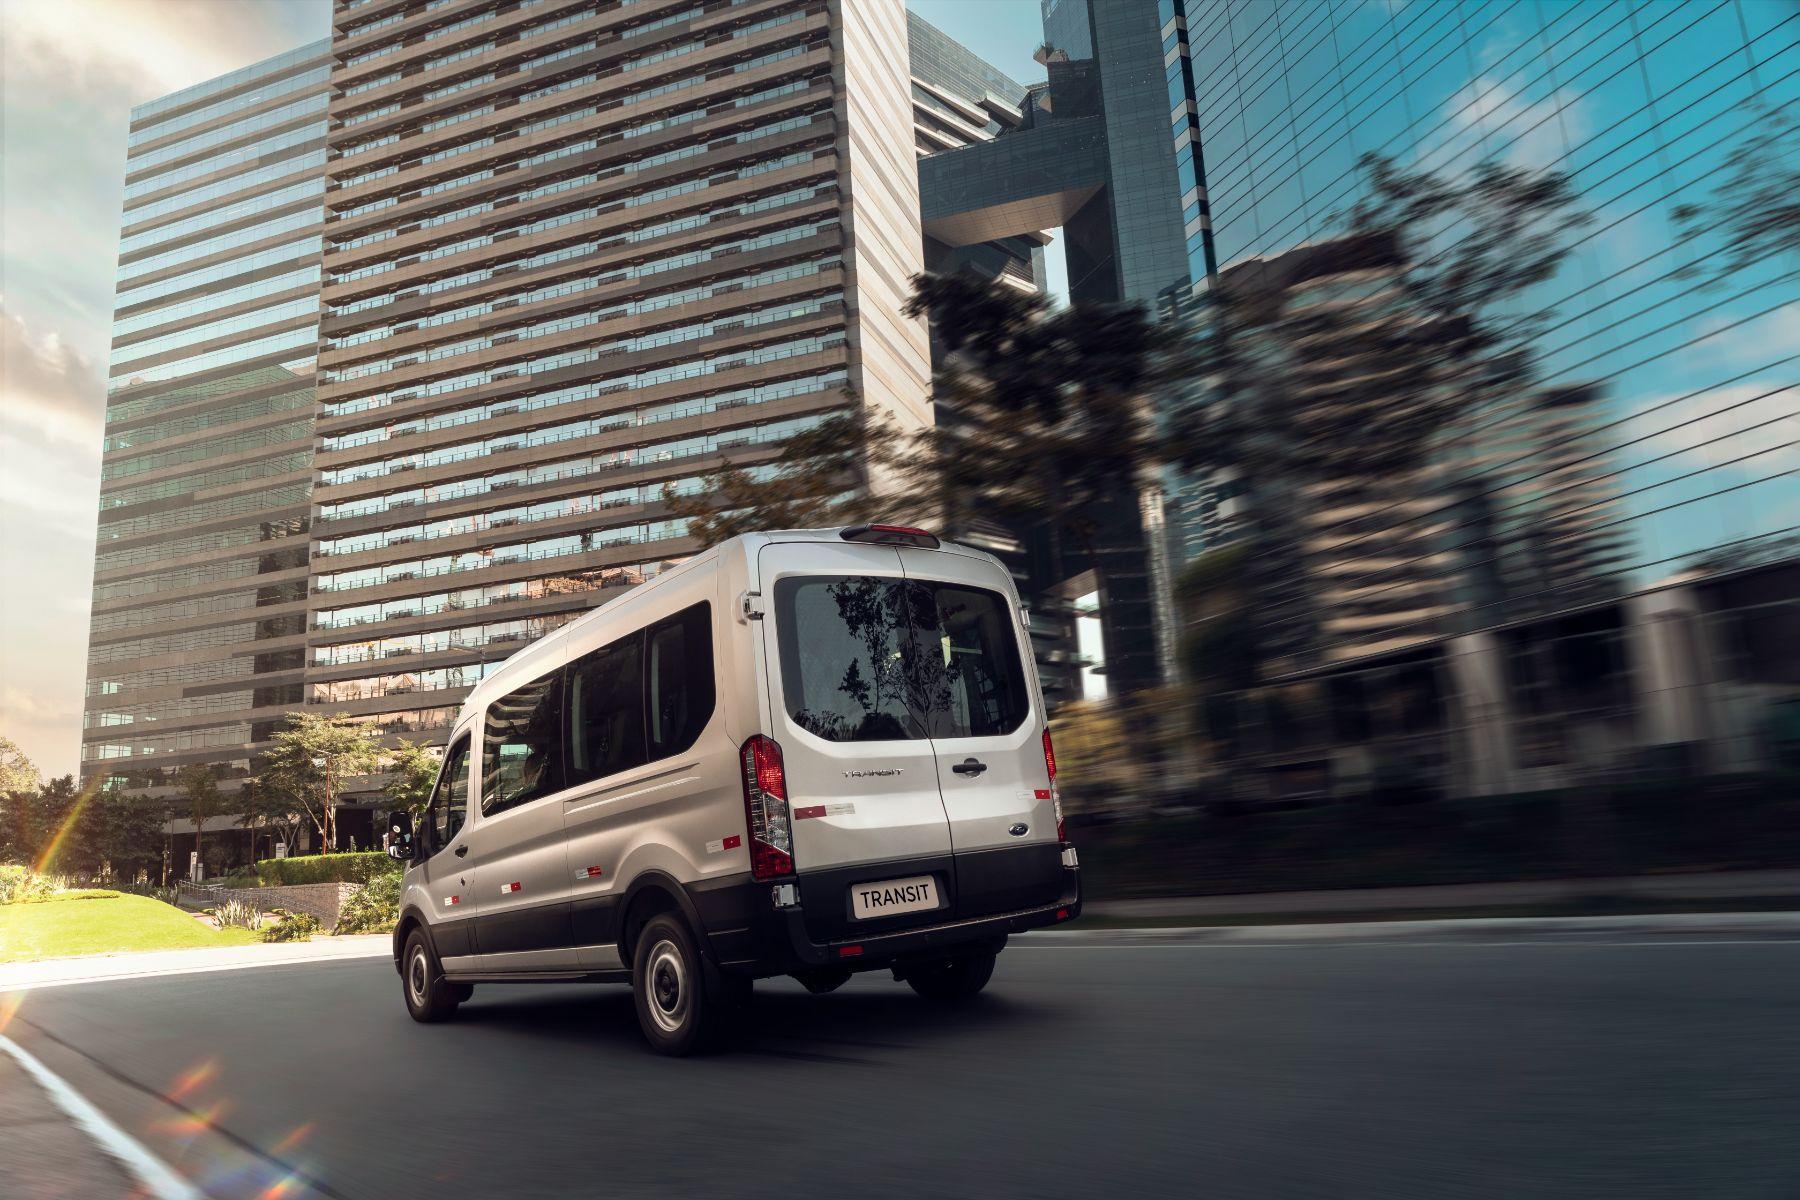 ford transit minibus prata traseira em movimento